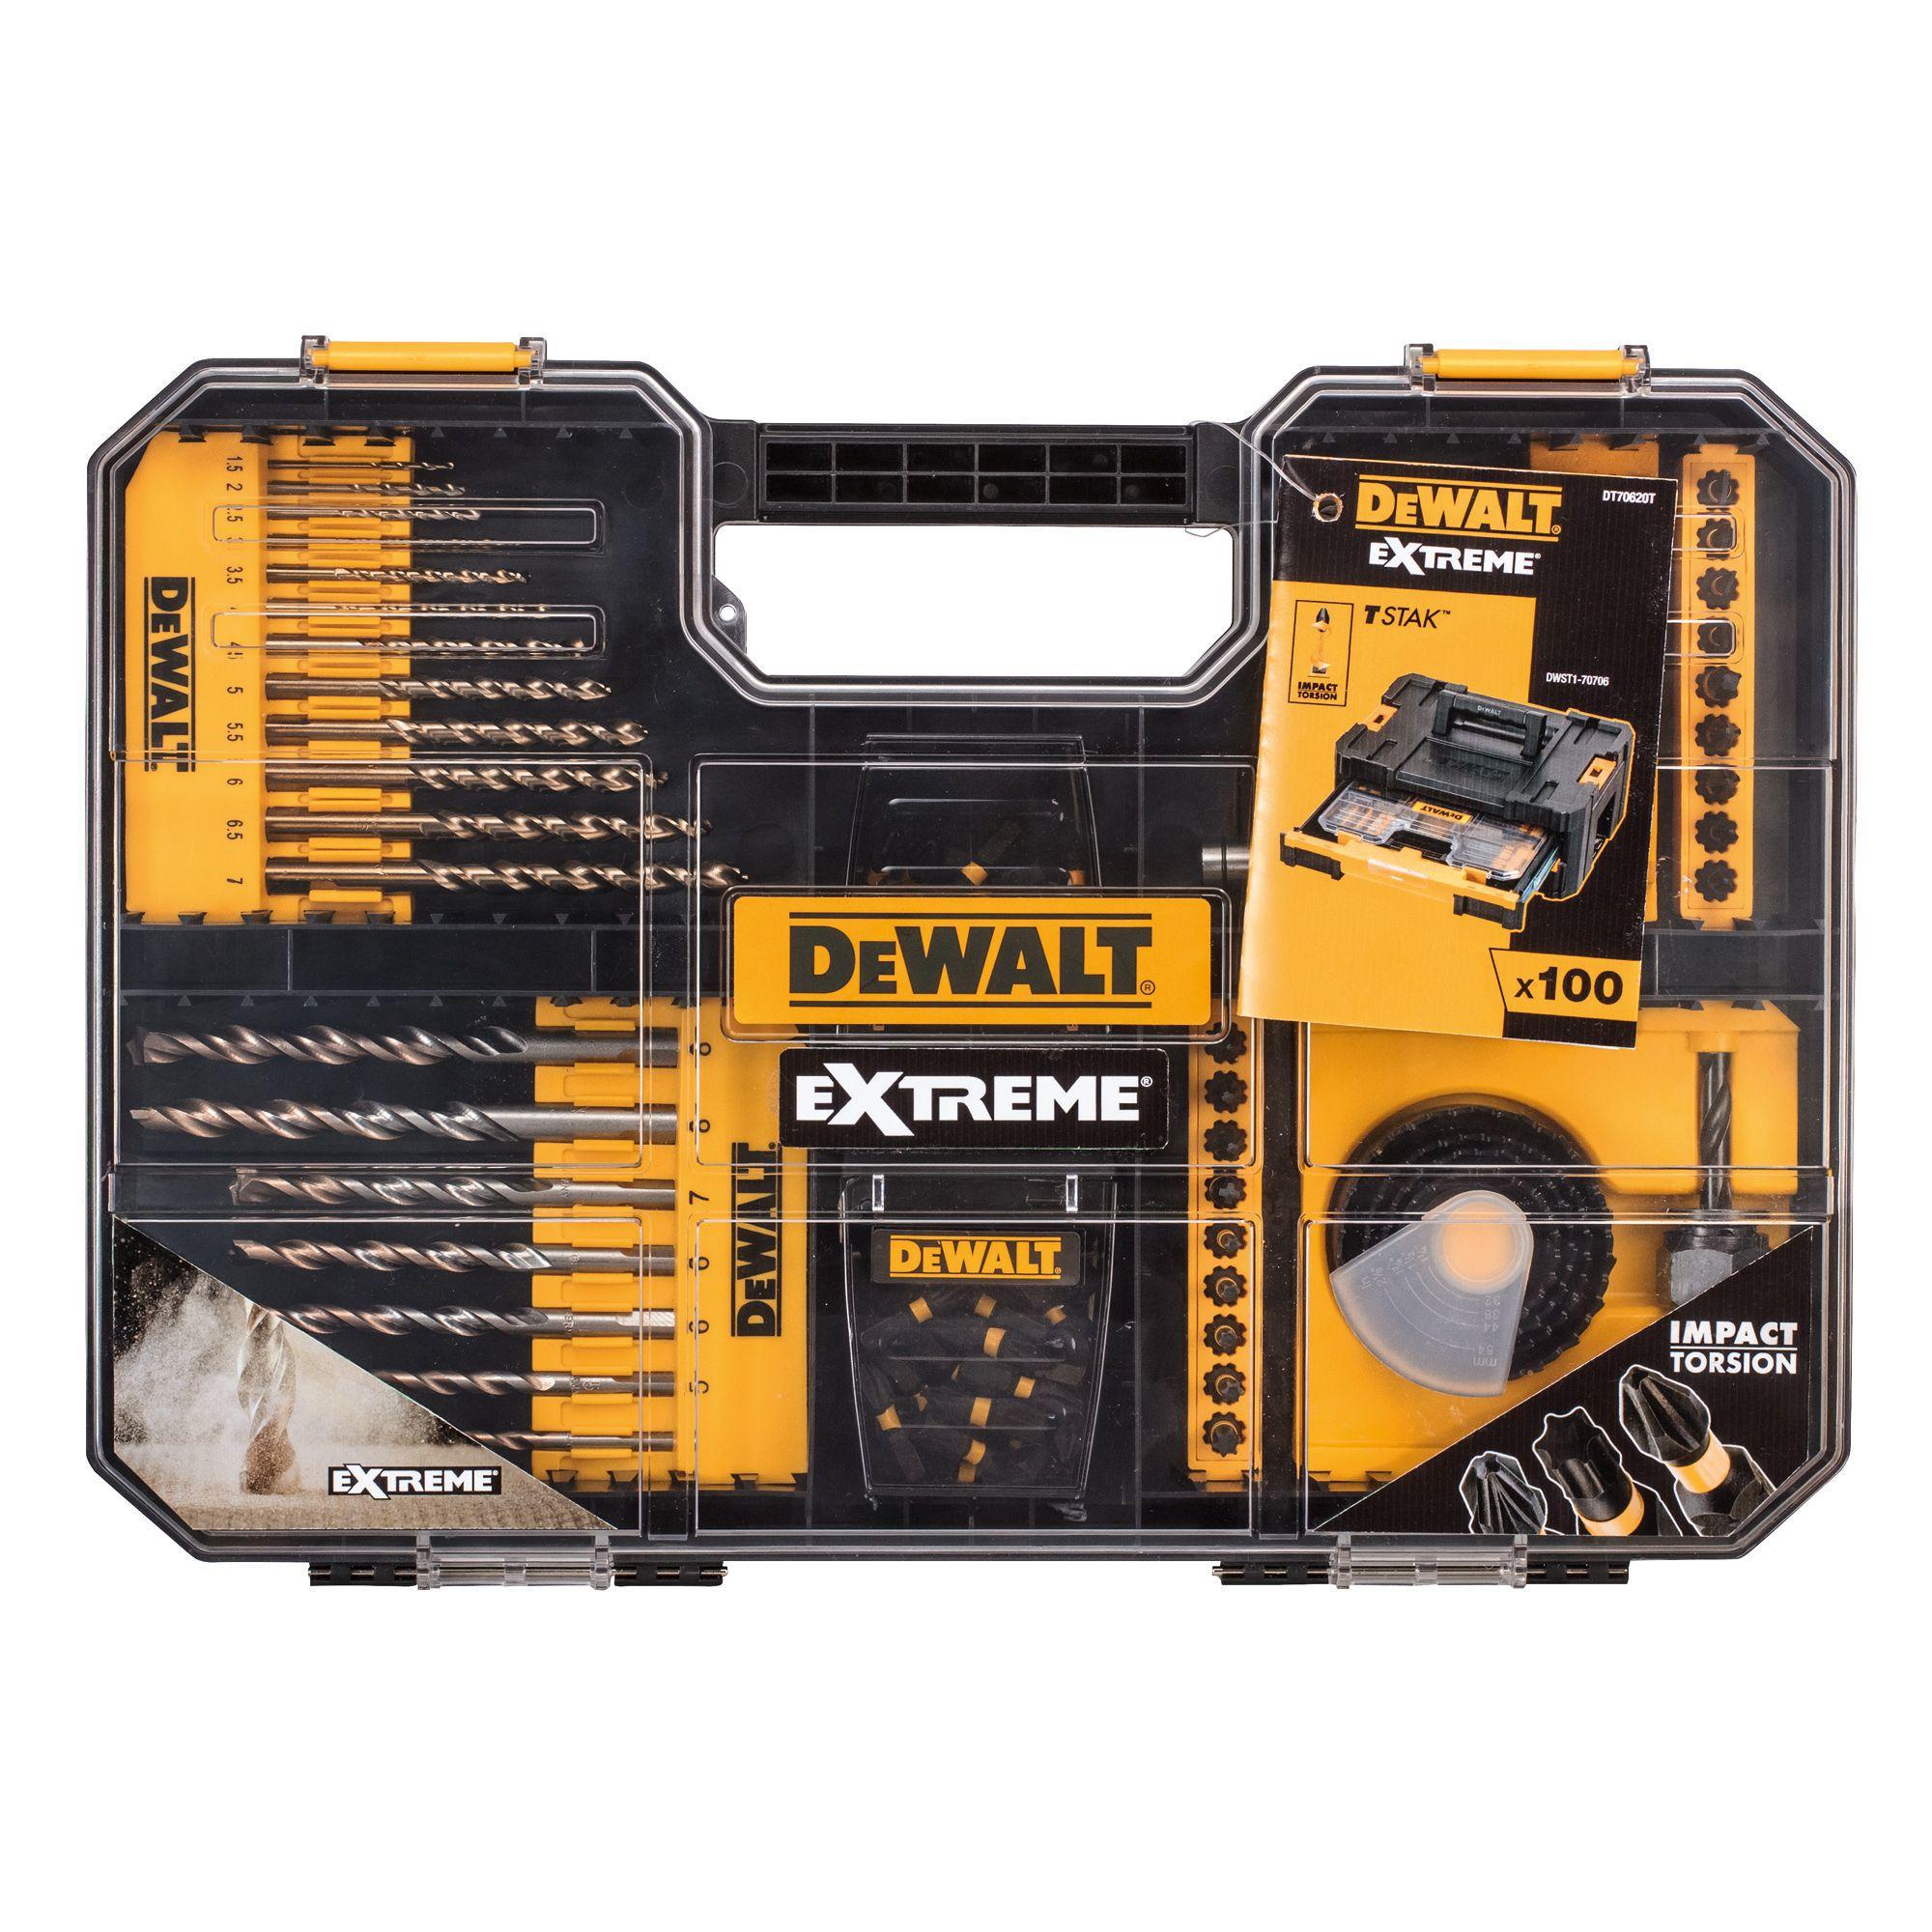 Dewalt Extreme Mixed Drill Bit Set 100 Set Departments